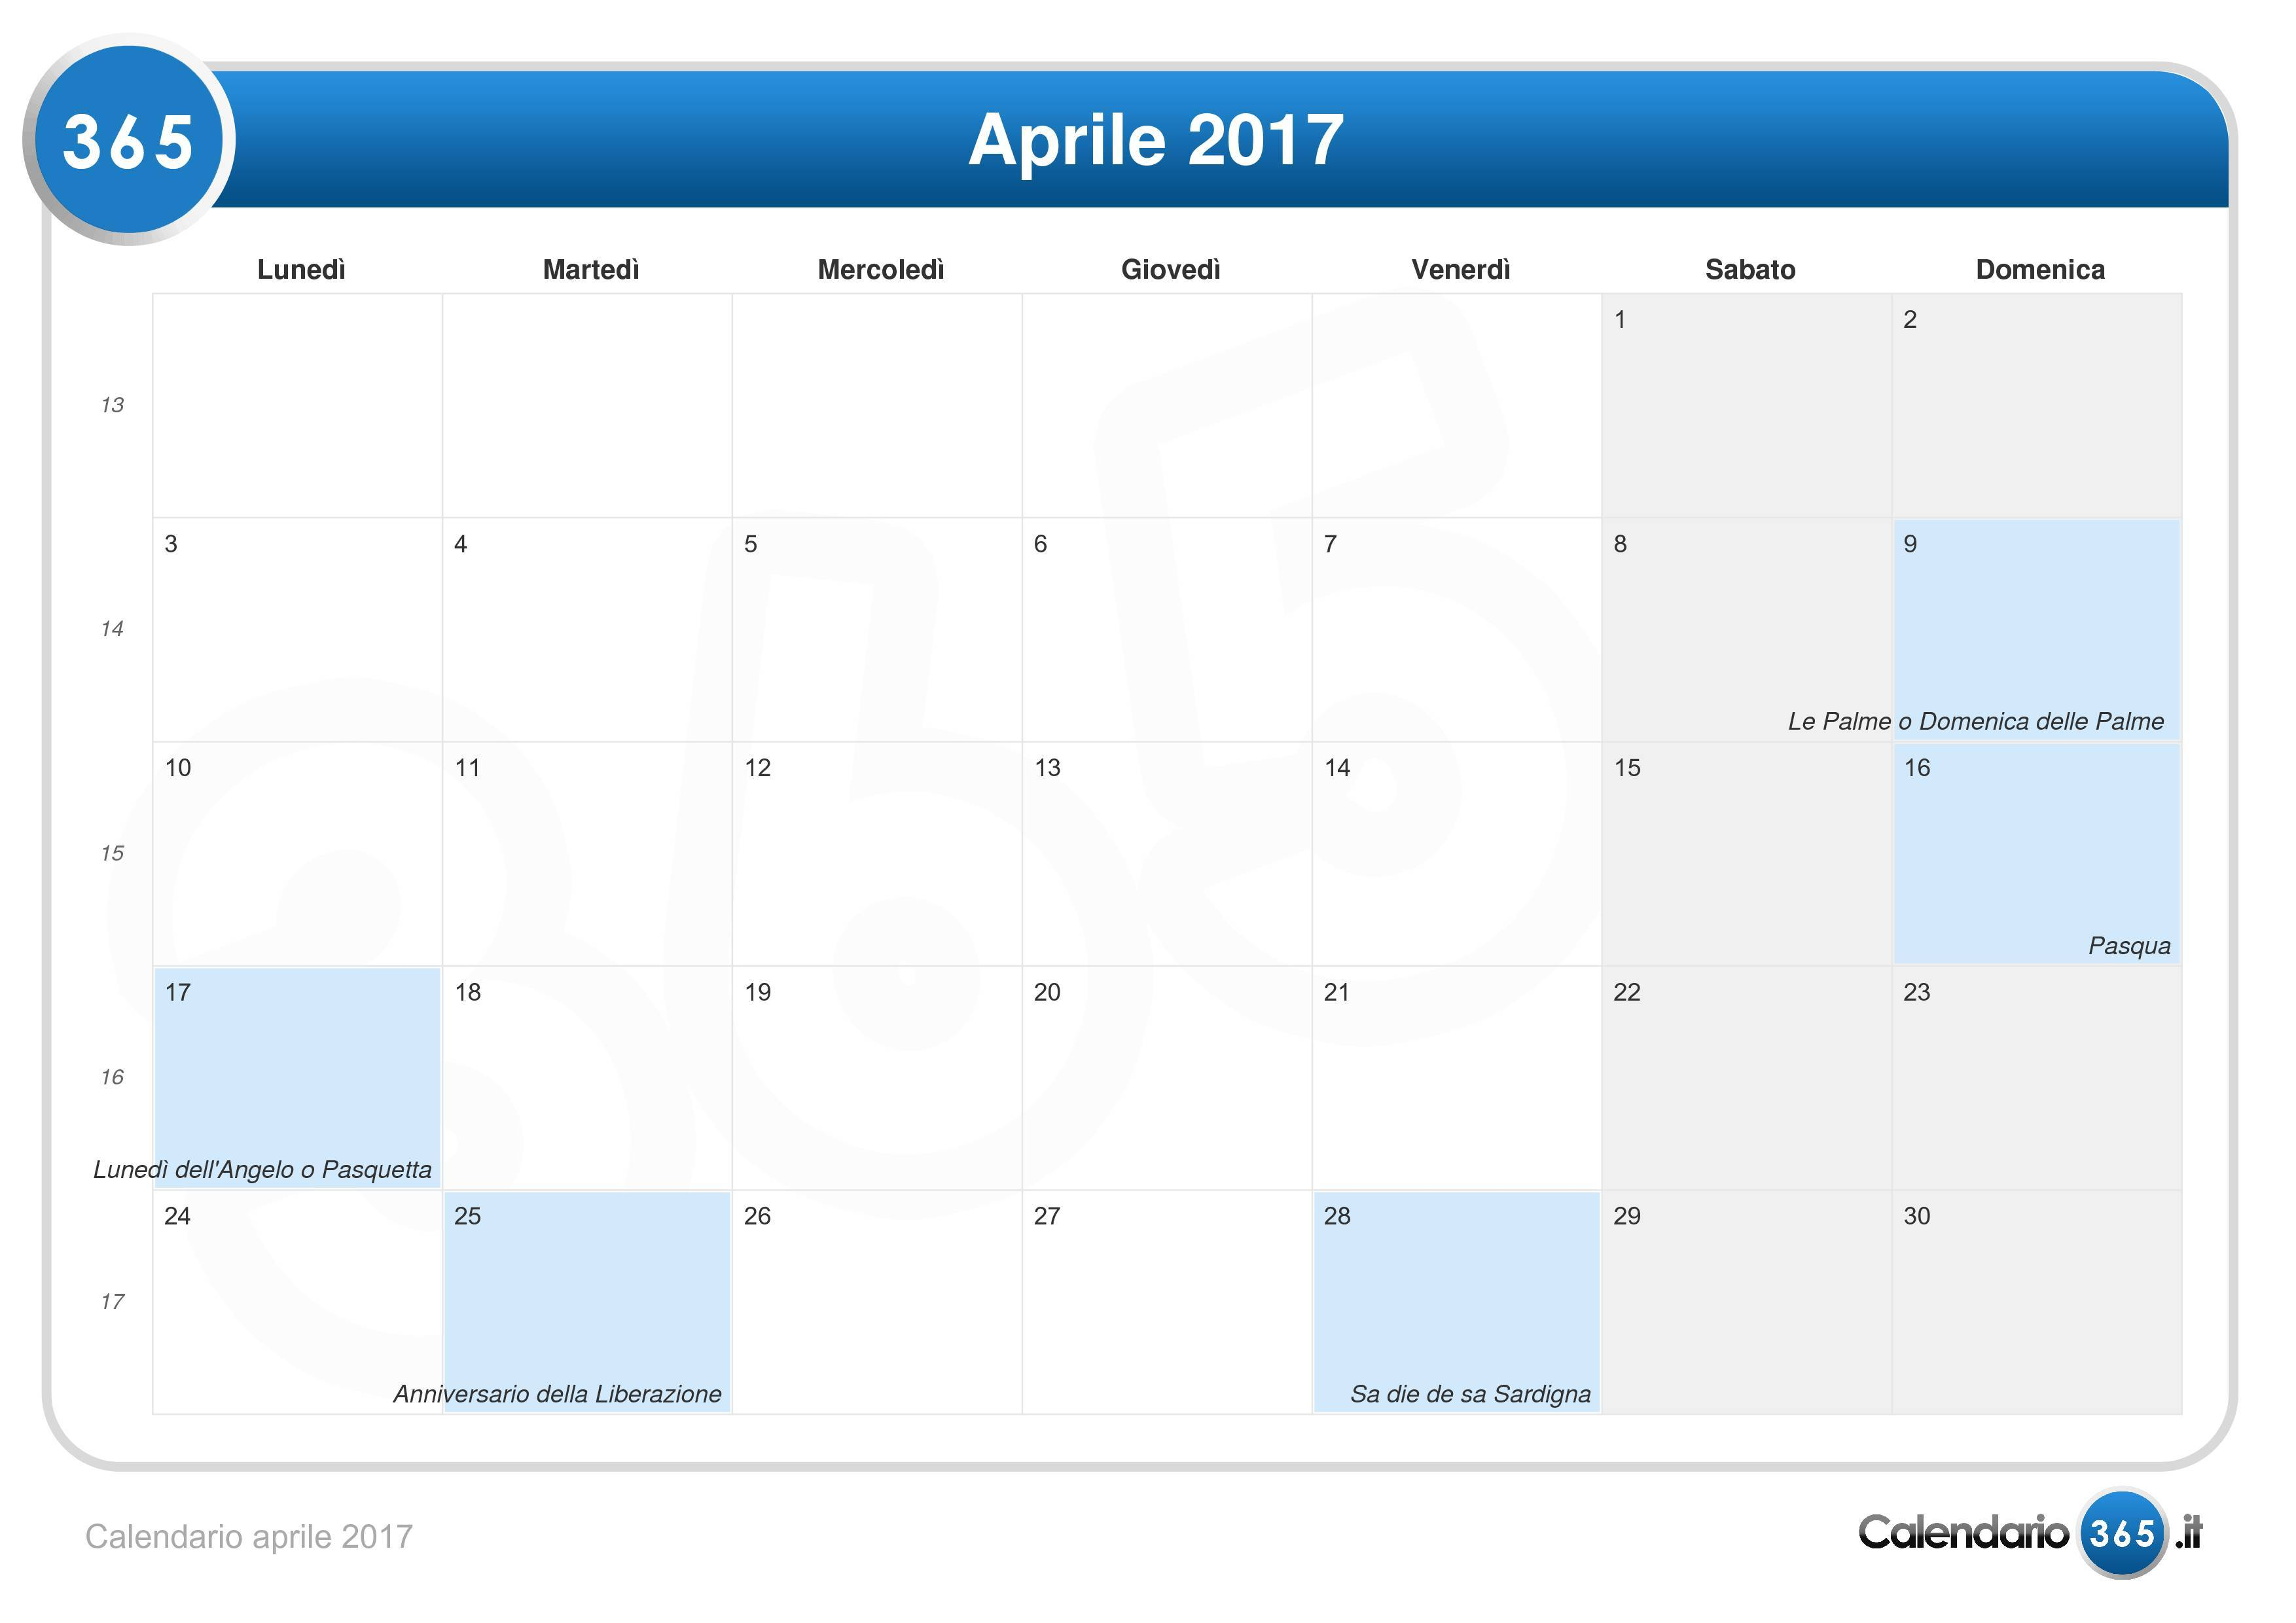 Calendario aprile 2017 for Calendario eventi milano 2017